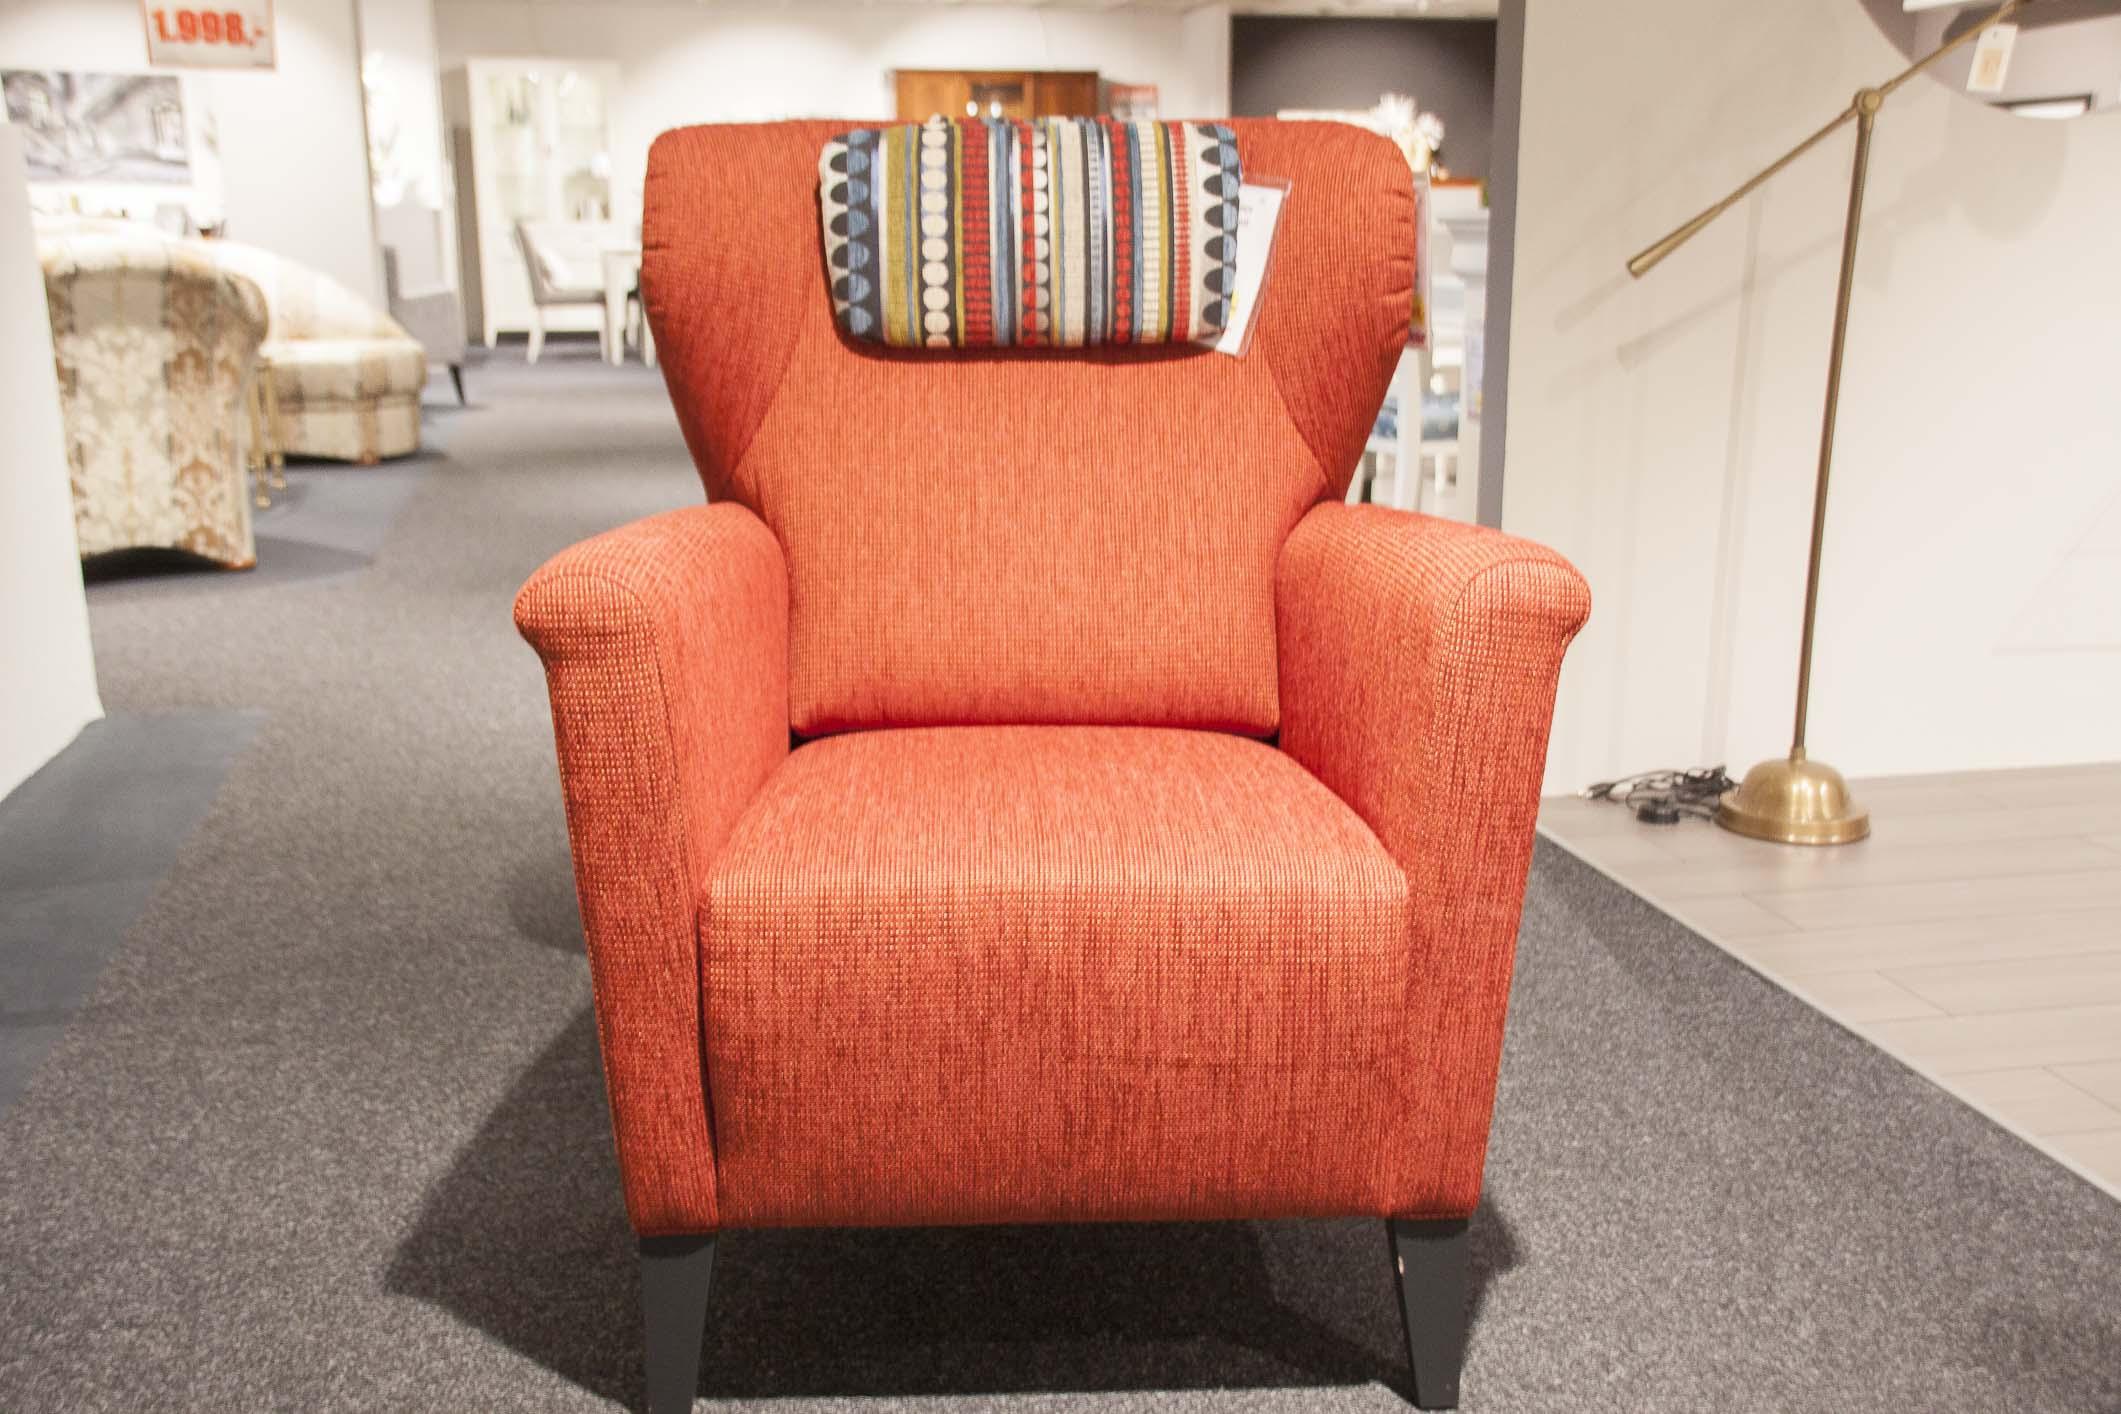 Roter Sessel und Kopfpolster (Puhlmann)